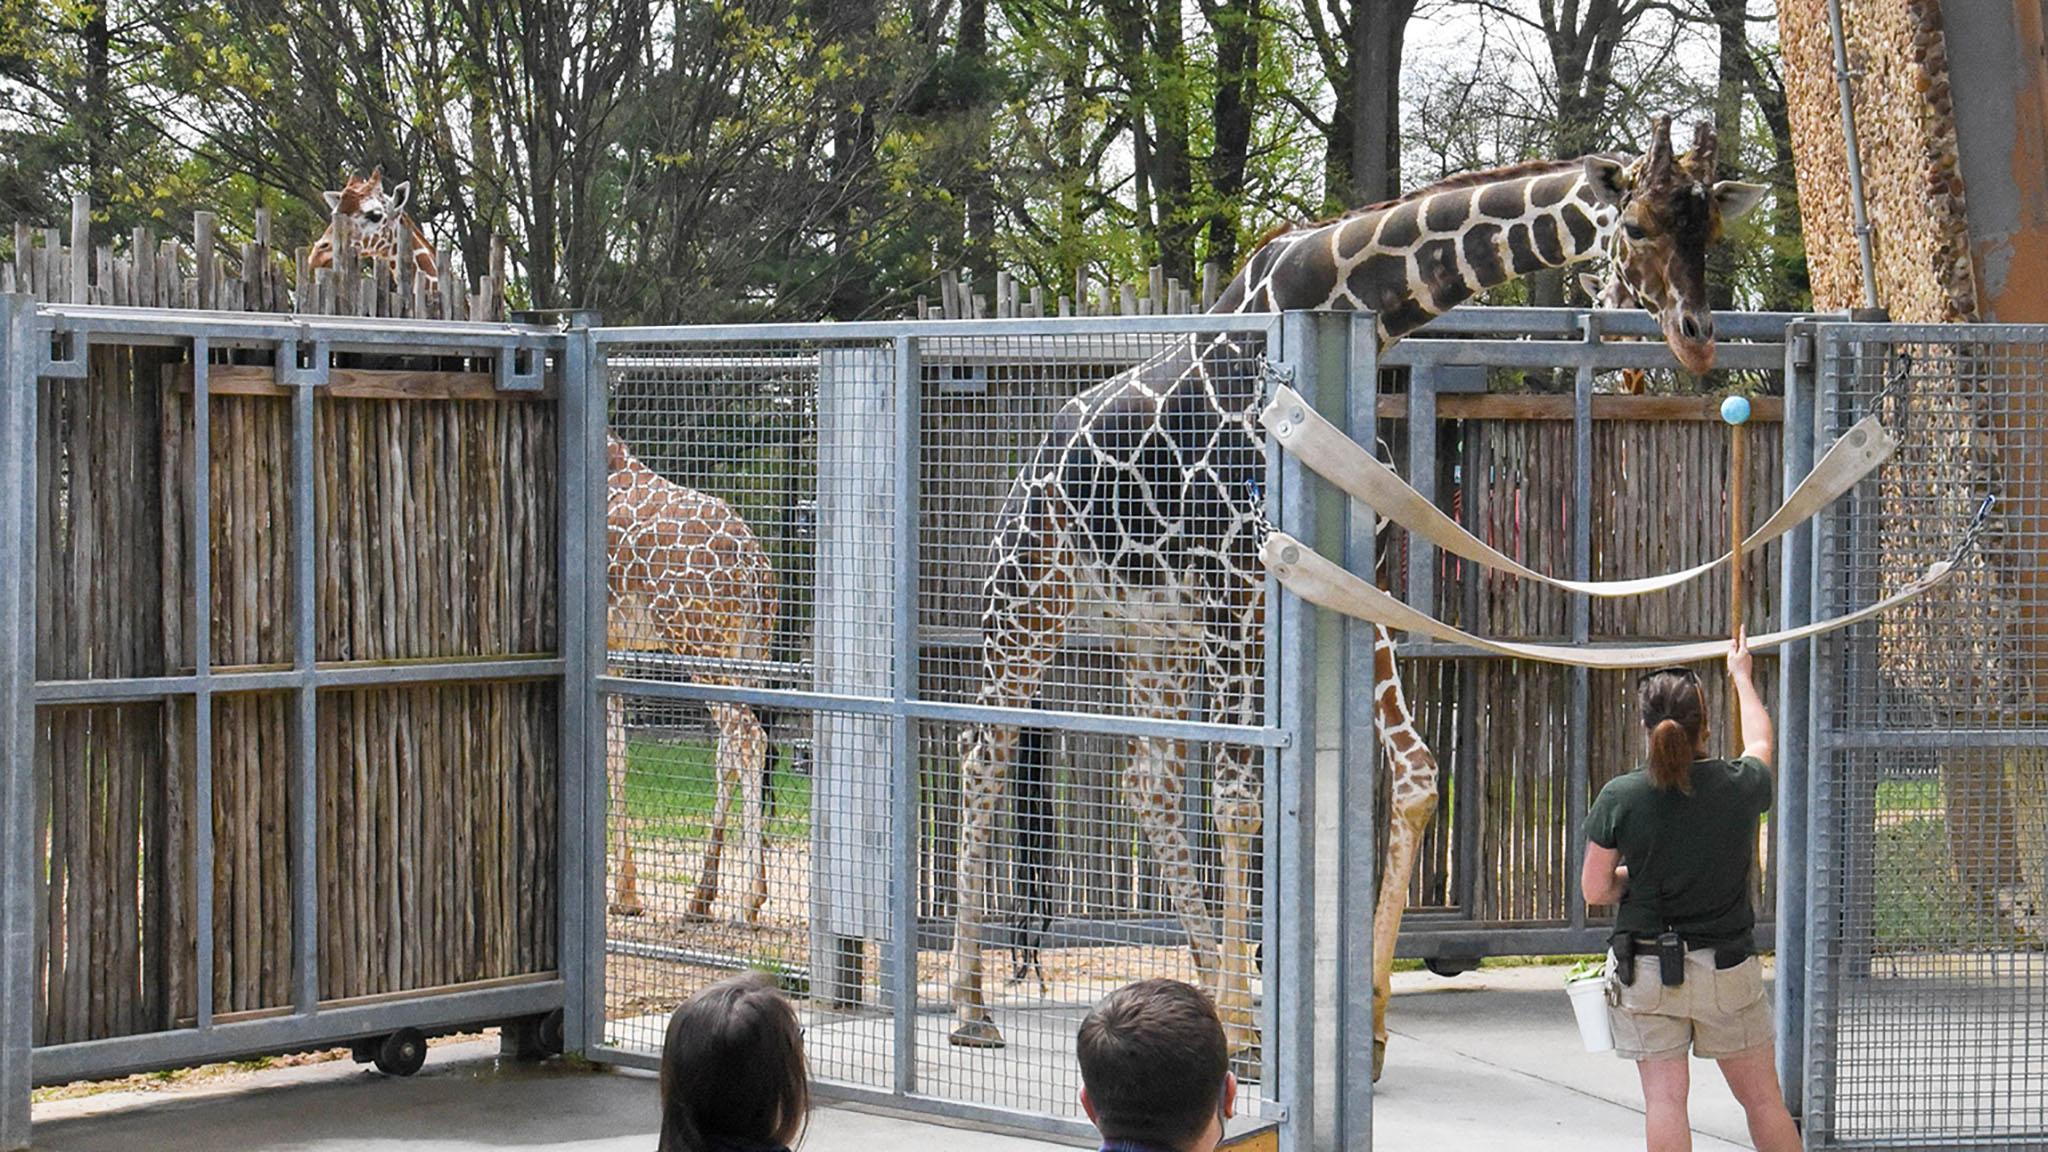 Zoo keeper training giraffe with guests watching.